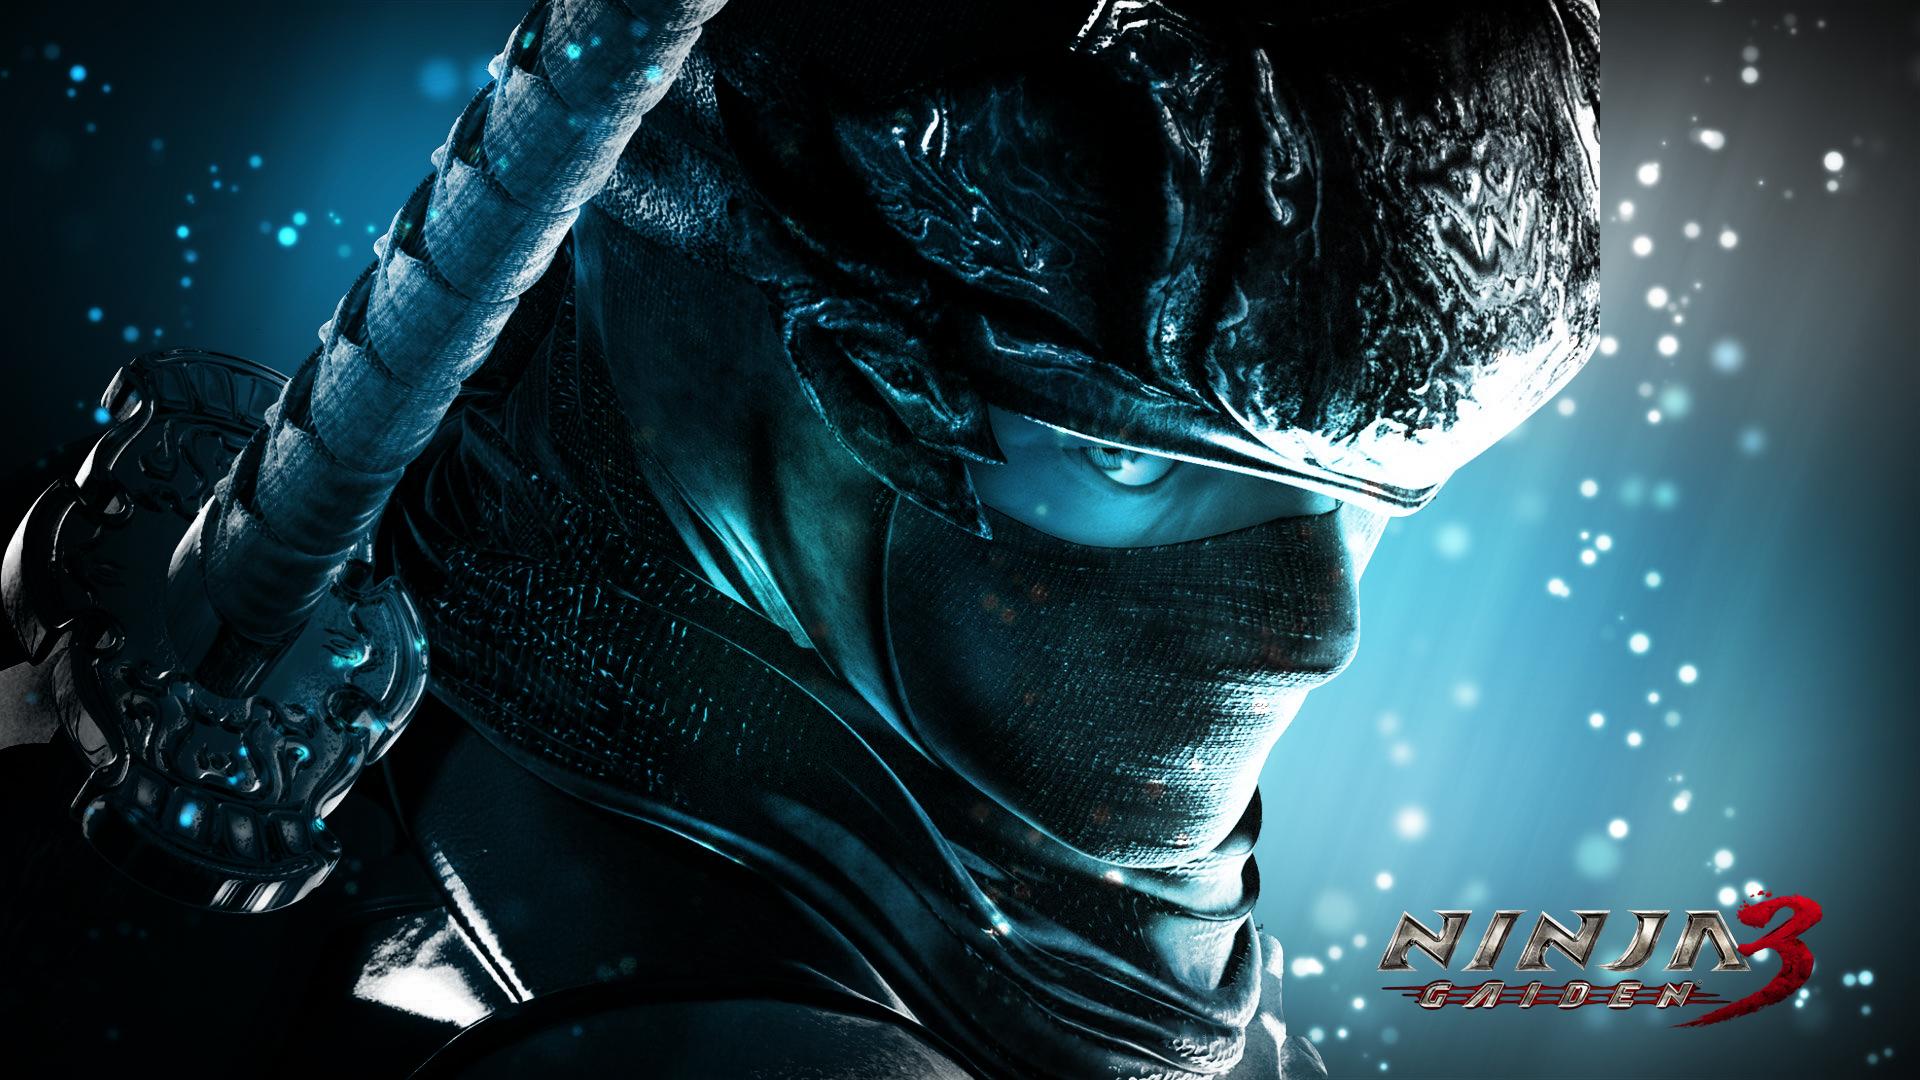 Ninja gaiden fantasy anime warrior weapon sword poster f - Ninja anime wallpaper ...